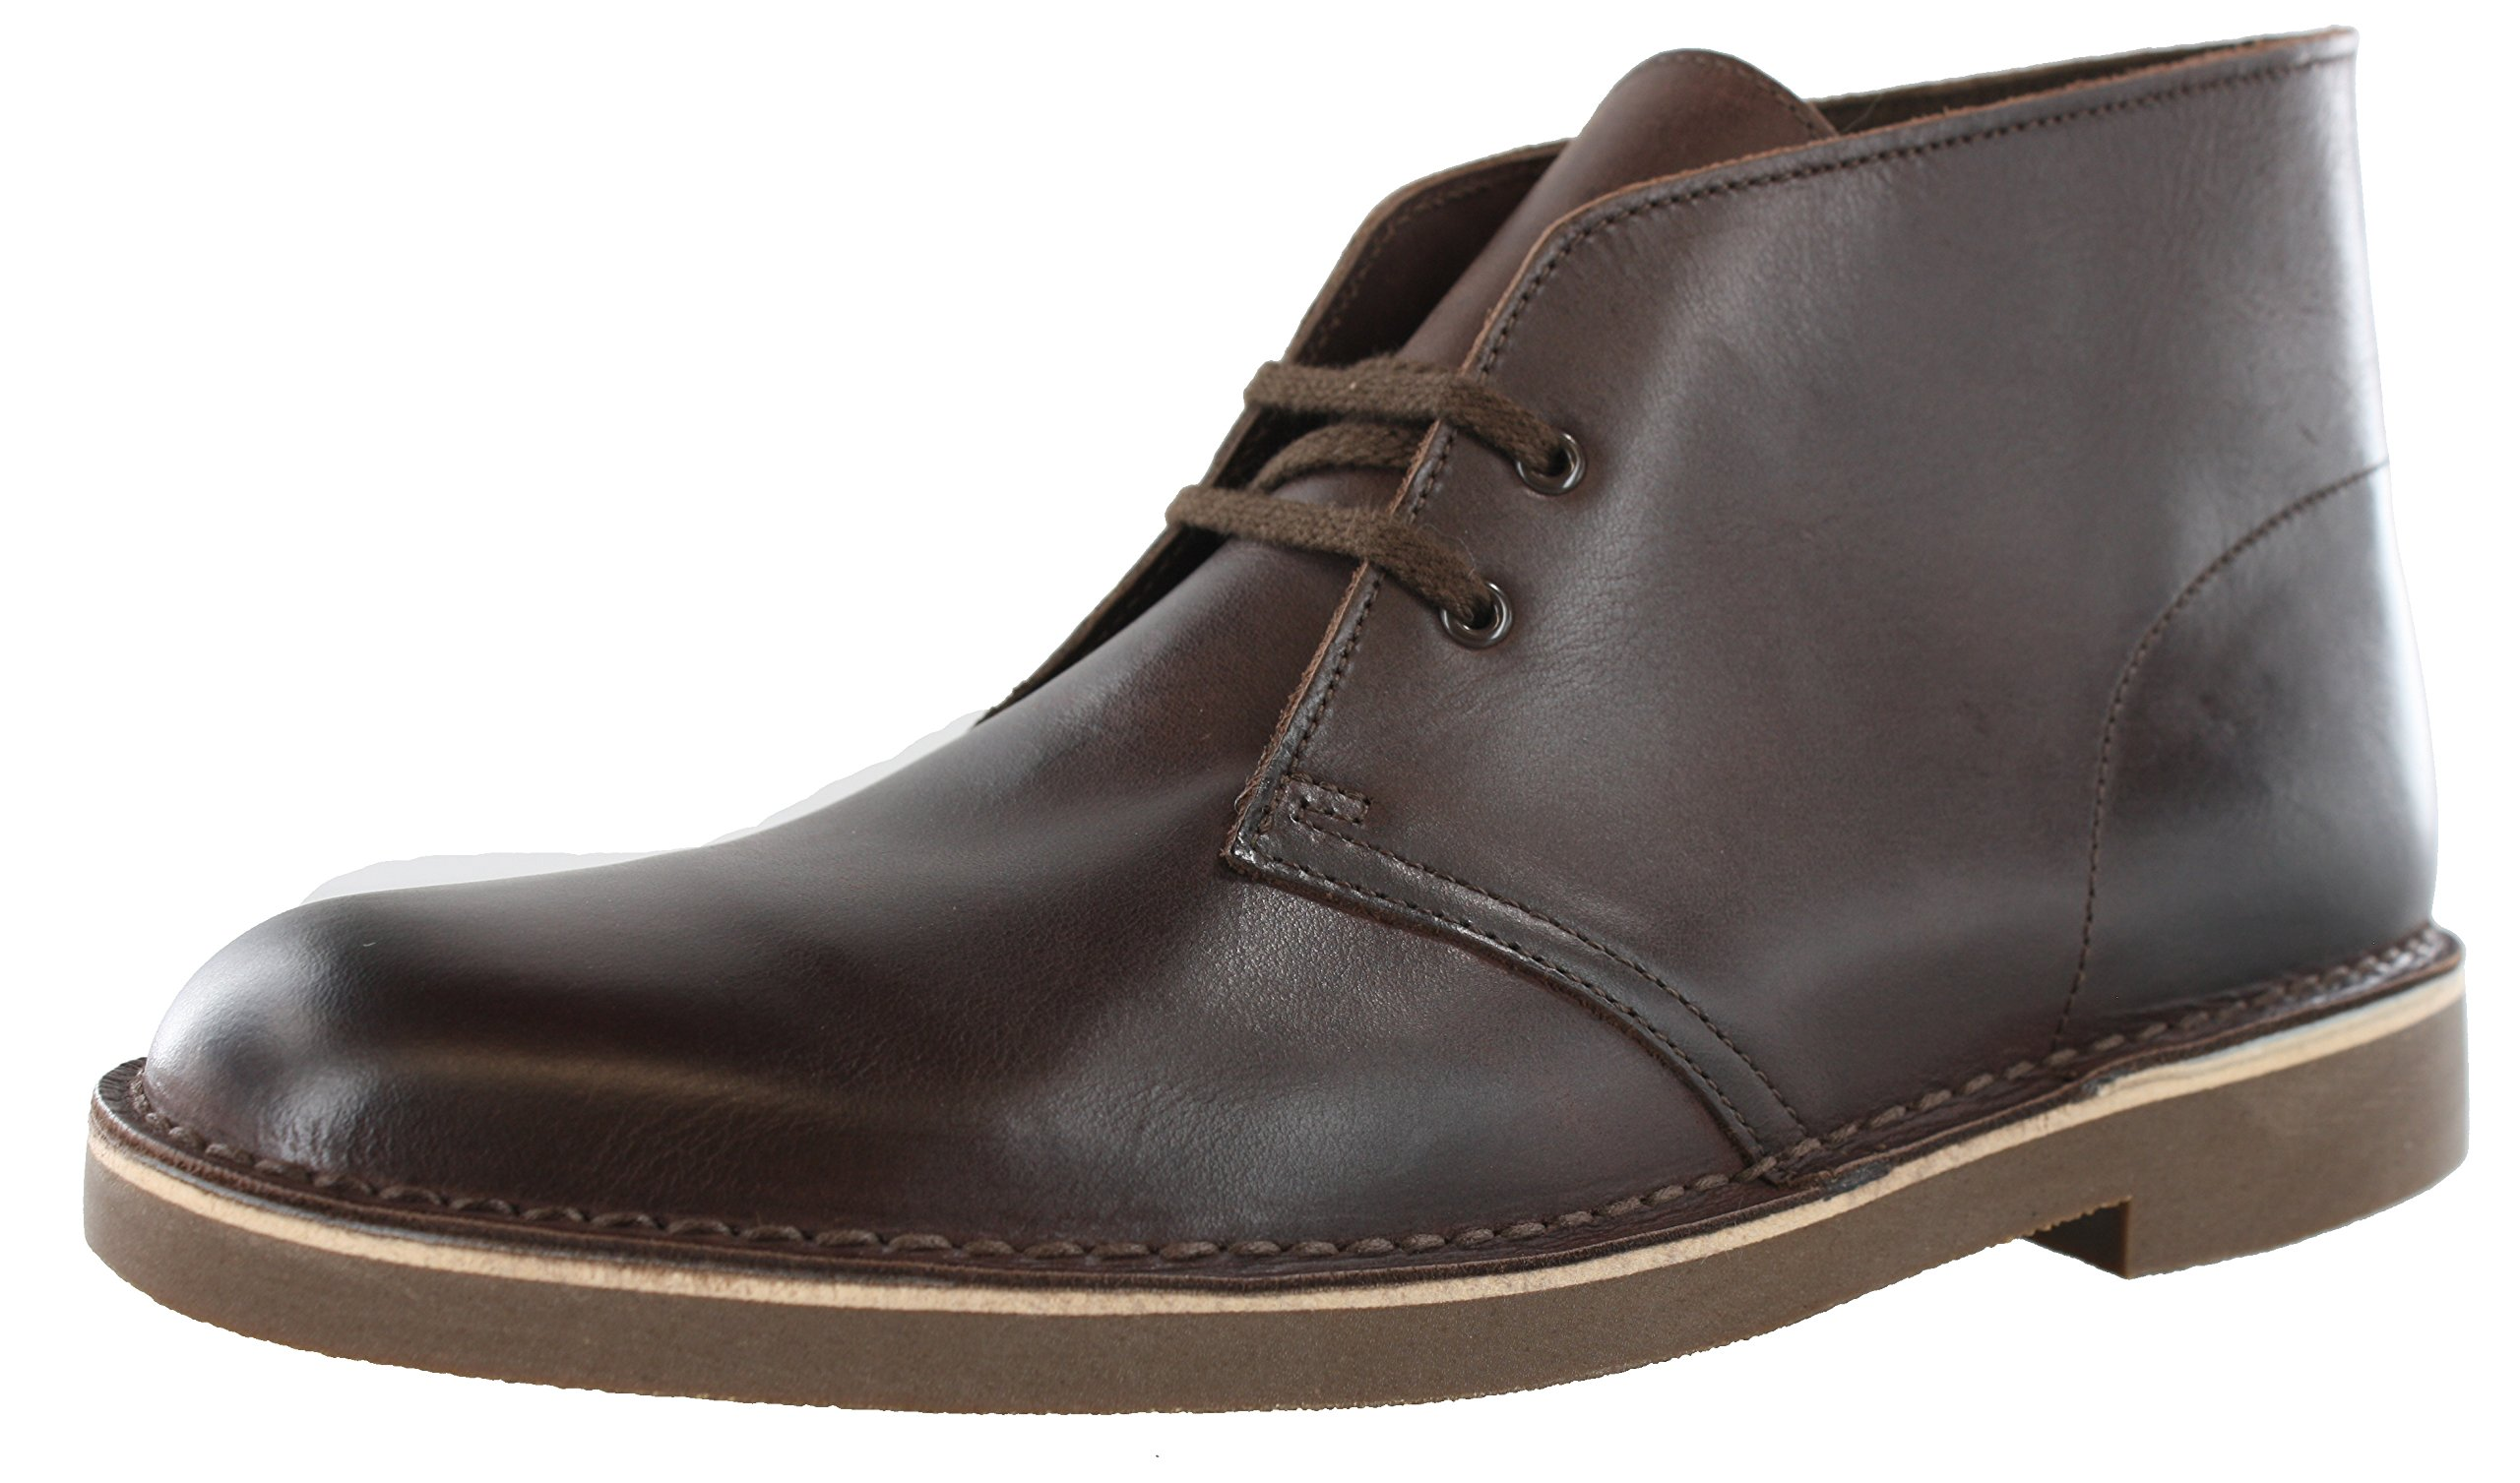 CLARKS Men's Bushacre 2 Chukka Boot, Dark Brown Leather, 10.5 M US